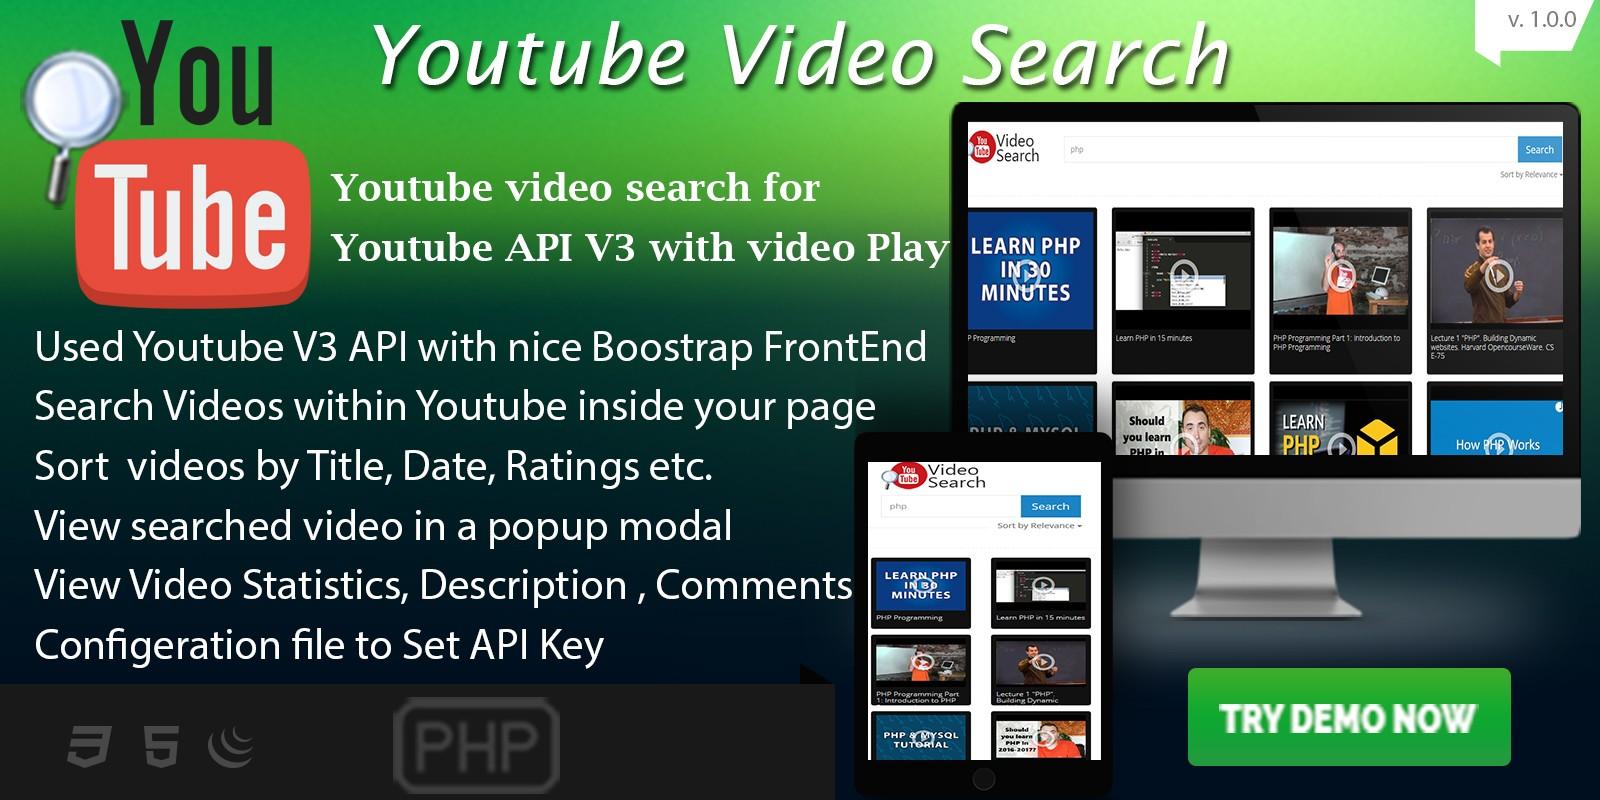 Youtube Video Search - Youtube API V3 PHP Script